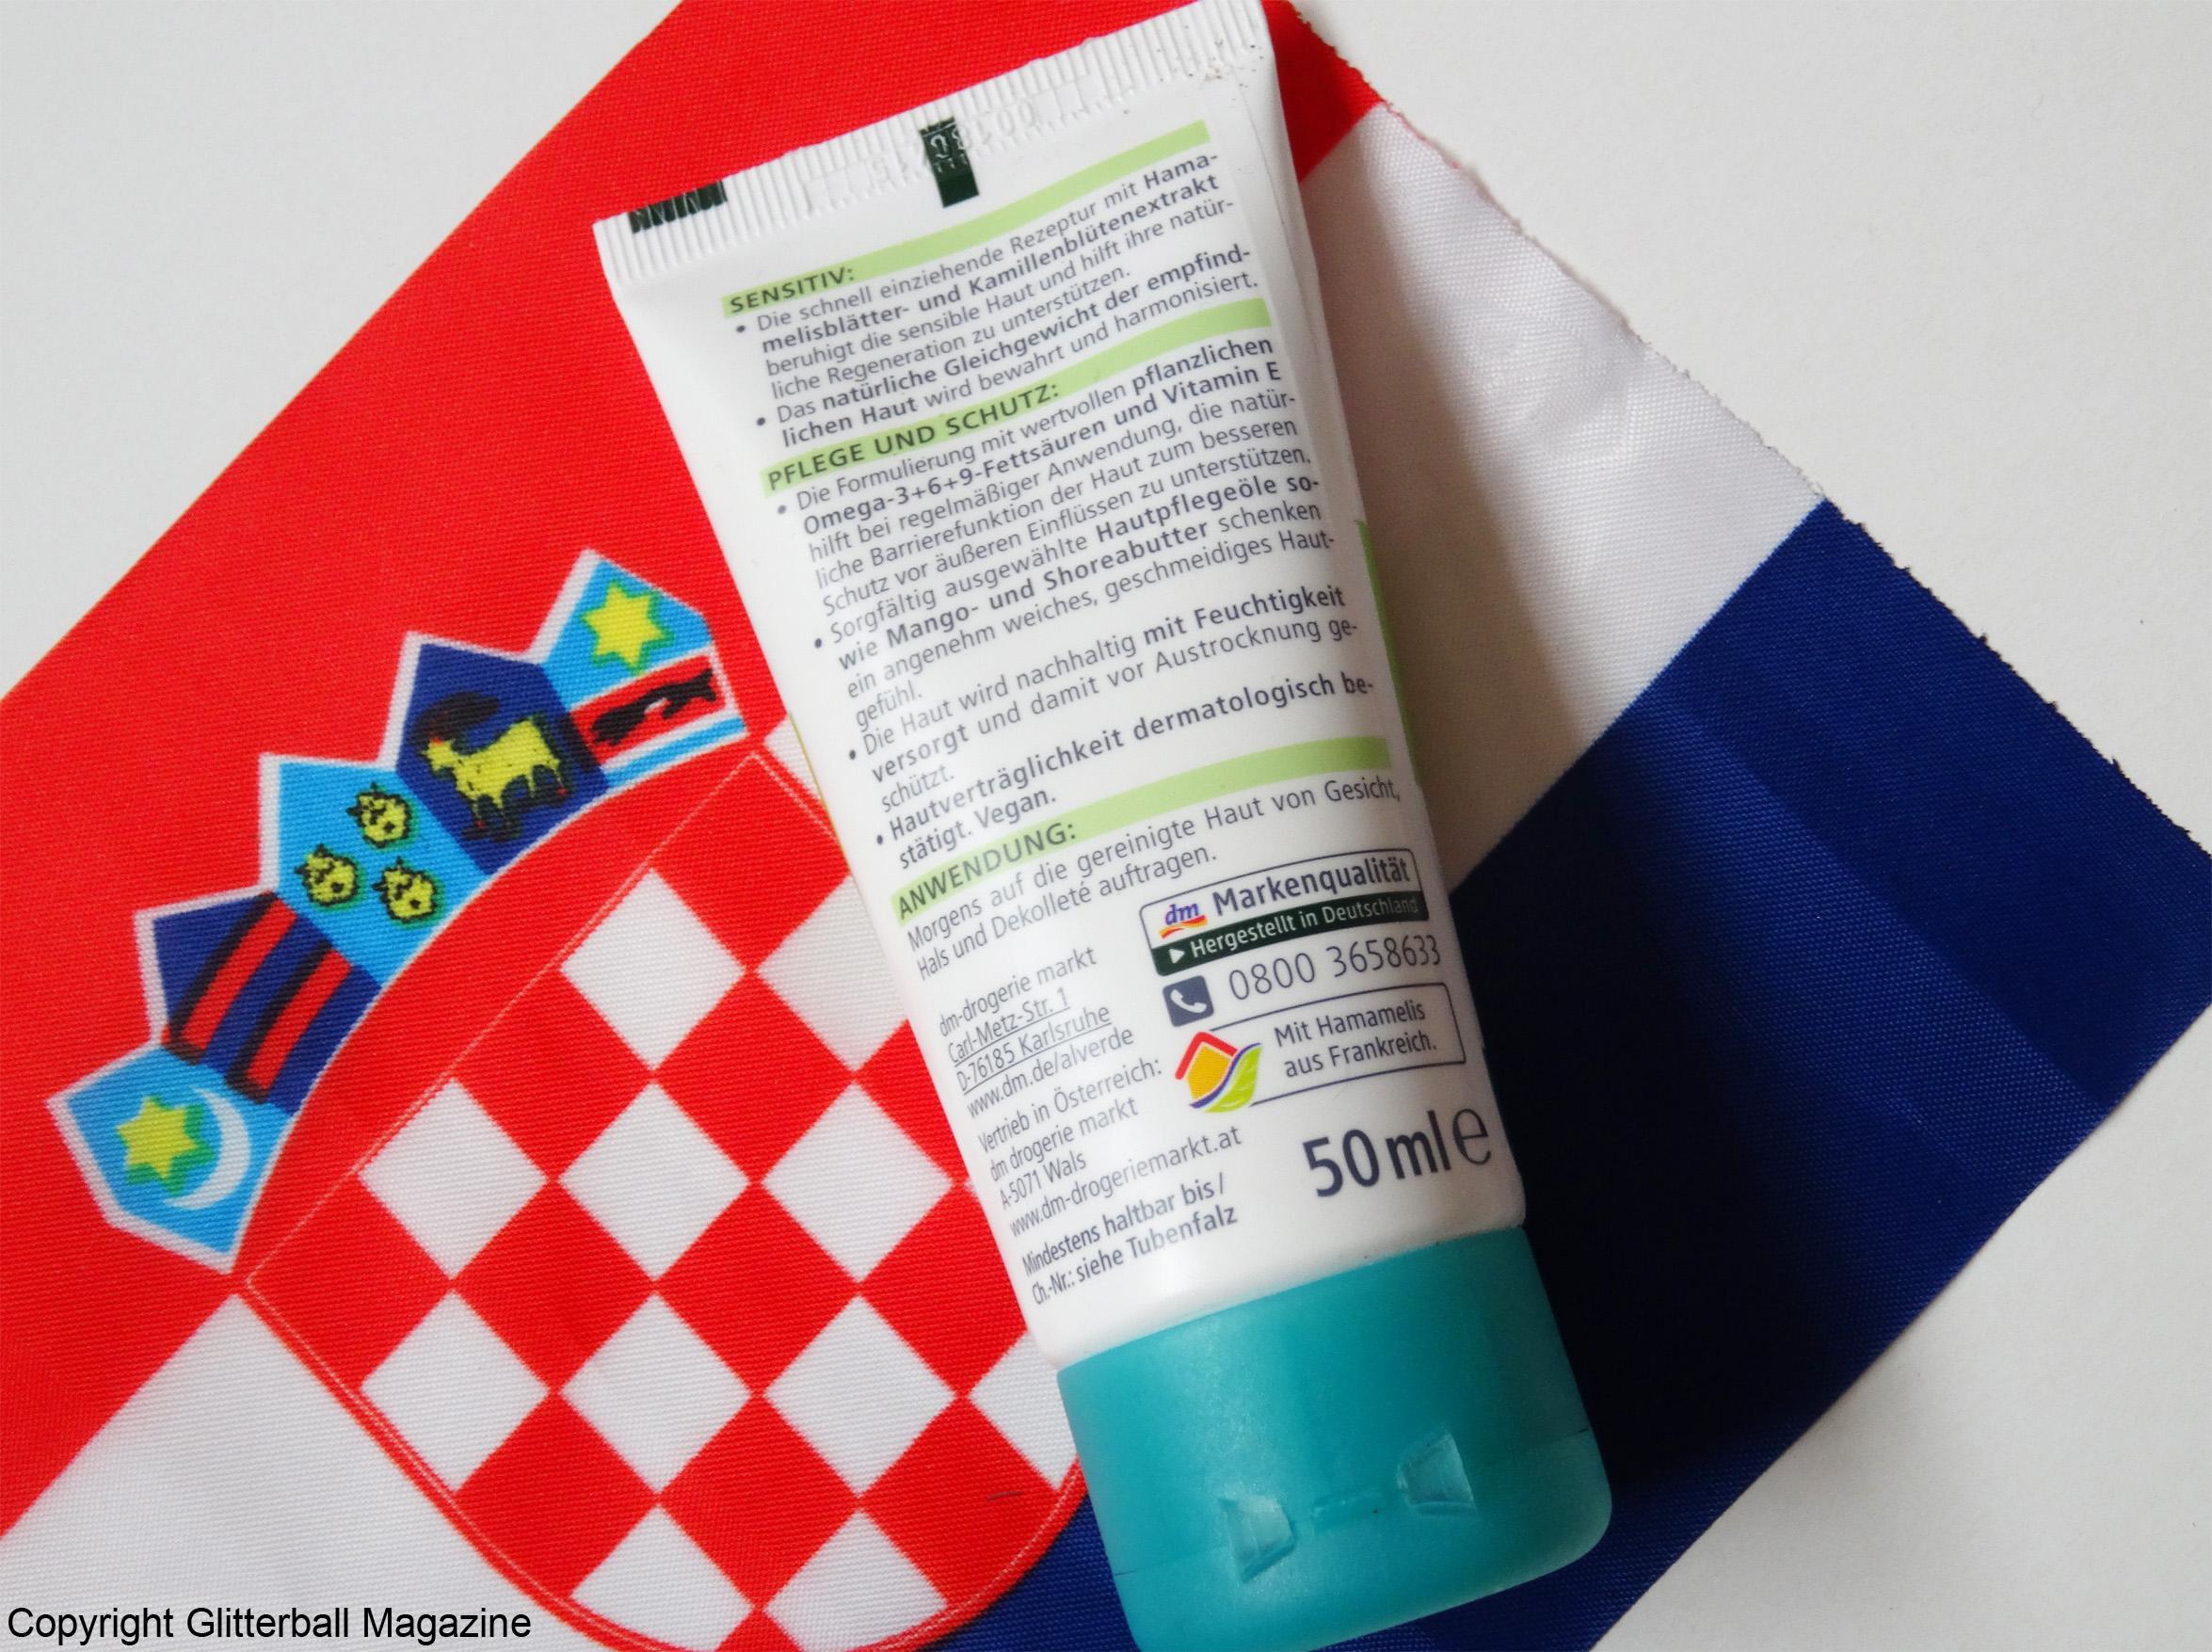 A Budget Beauty Haul From Croatia 7